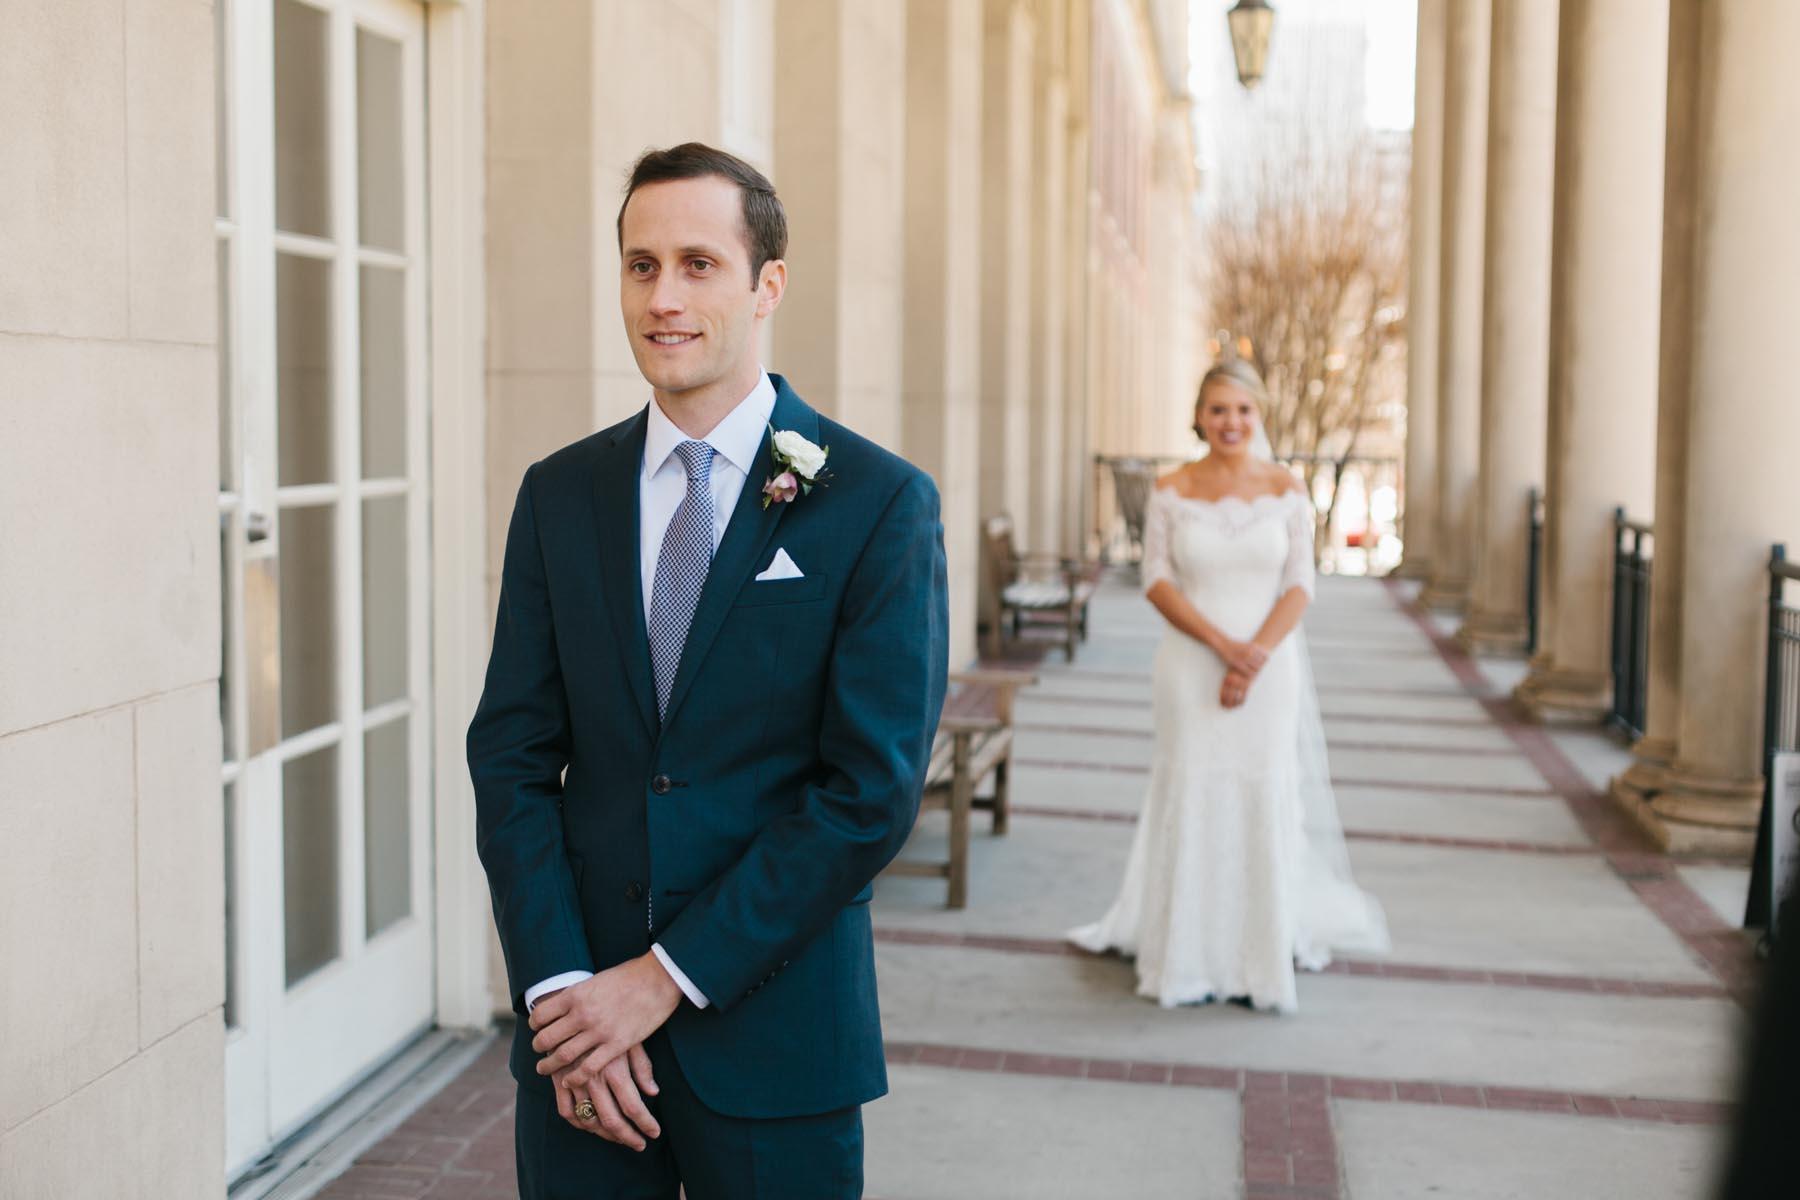 kjellman wedding blog biltmore wedding -29